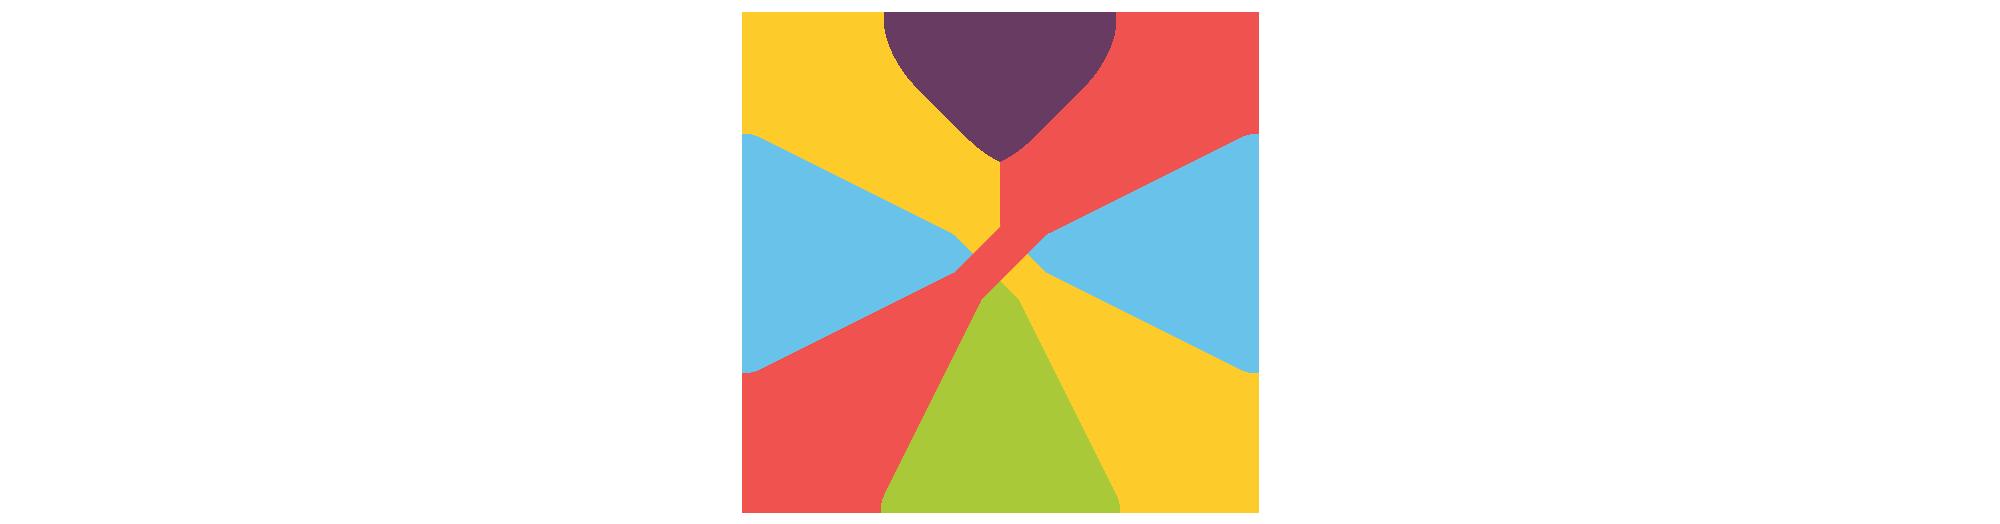 logo-symbol-transparent-small.png